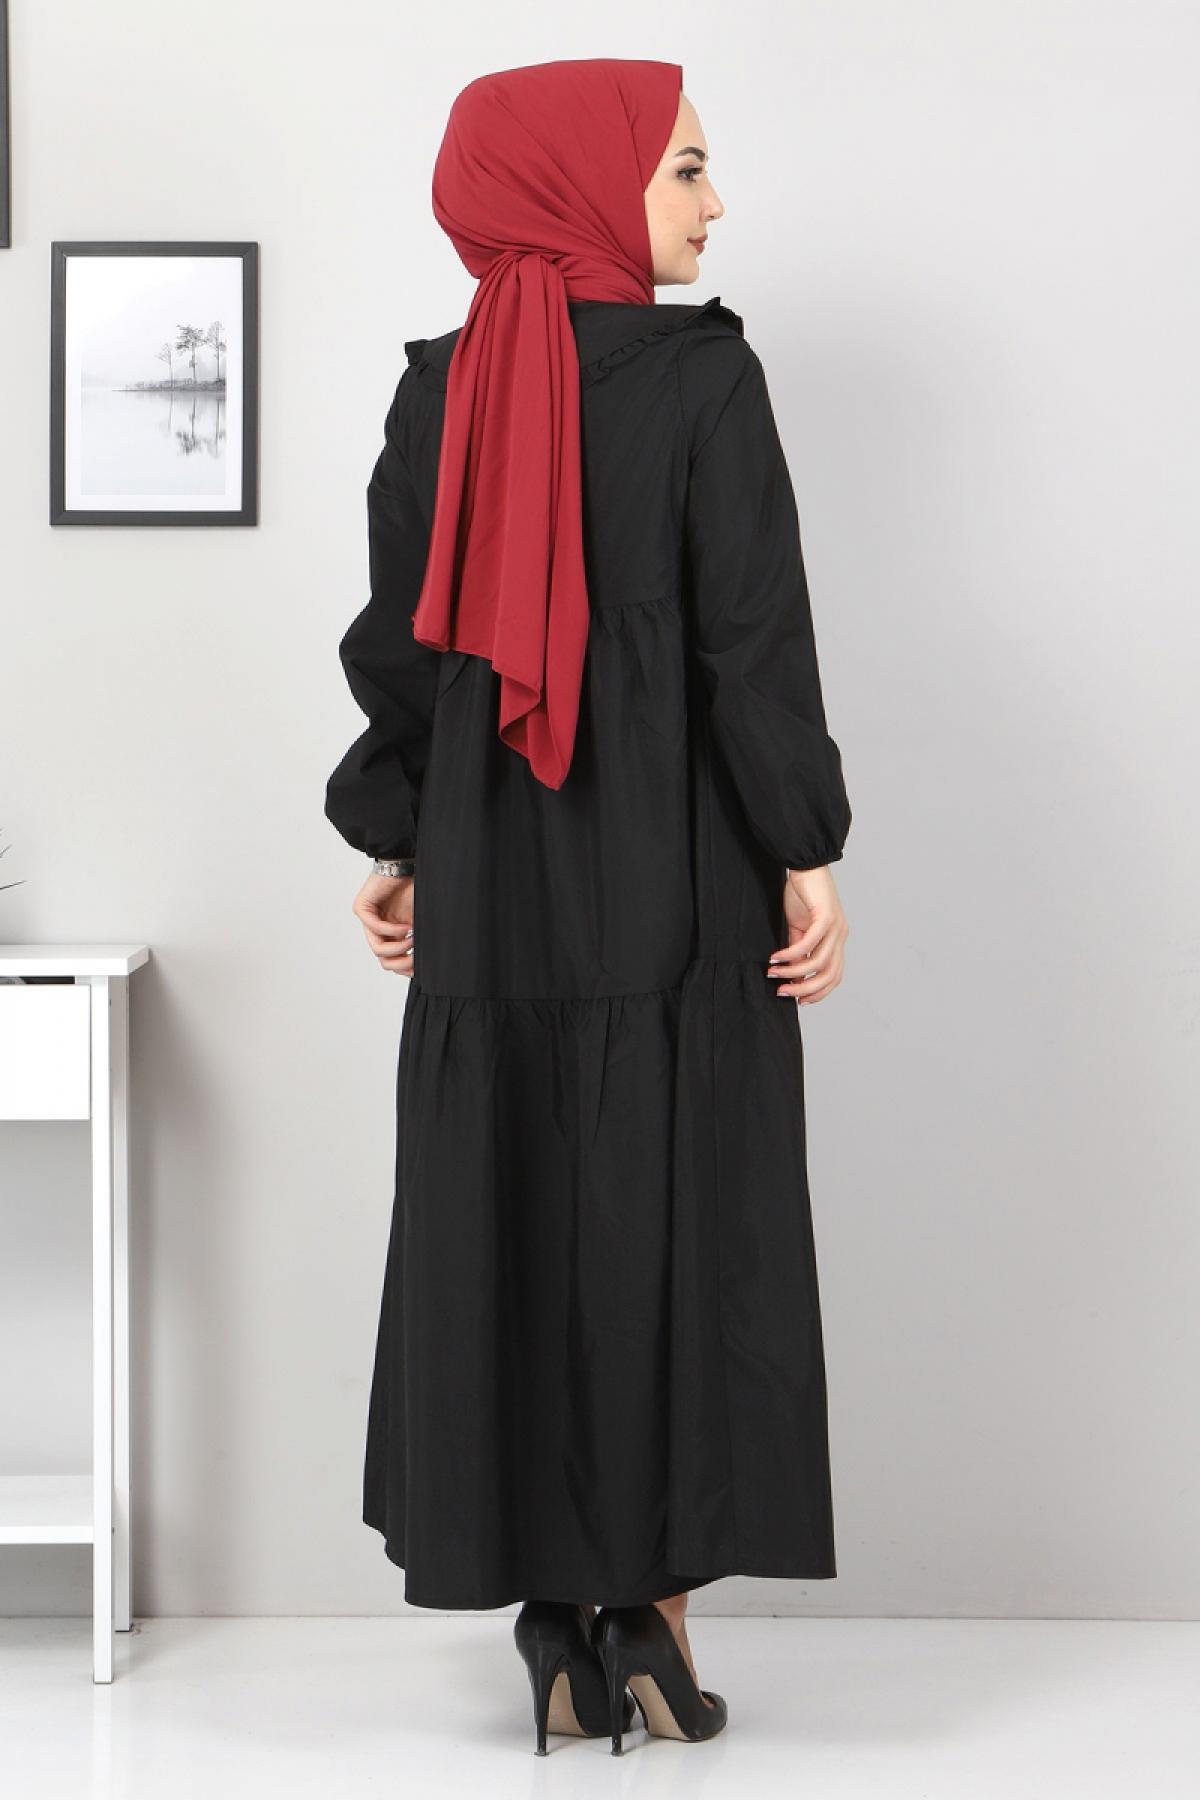 Bebe Yaka Tesettür Elbise TSD0706 Siyah